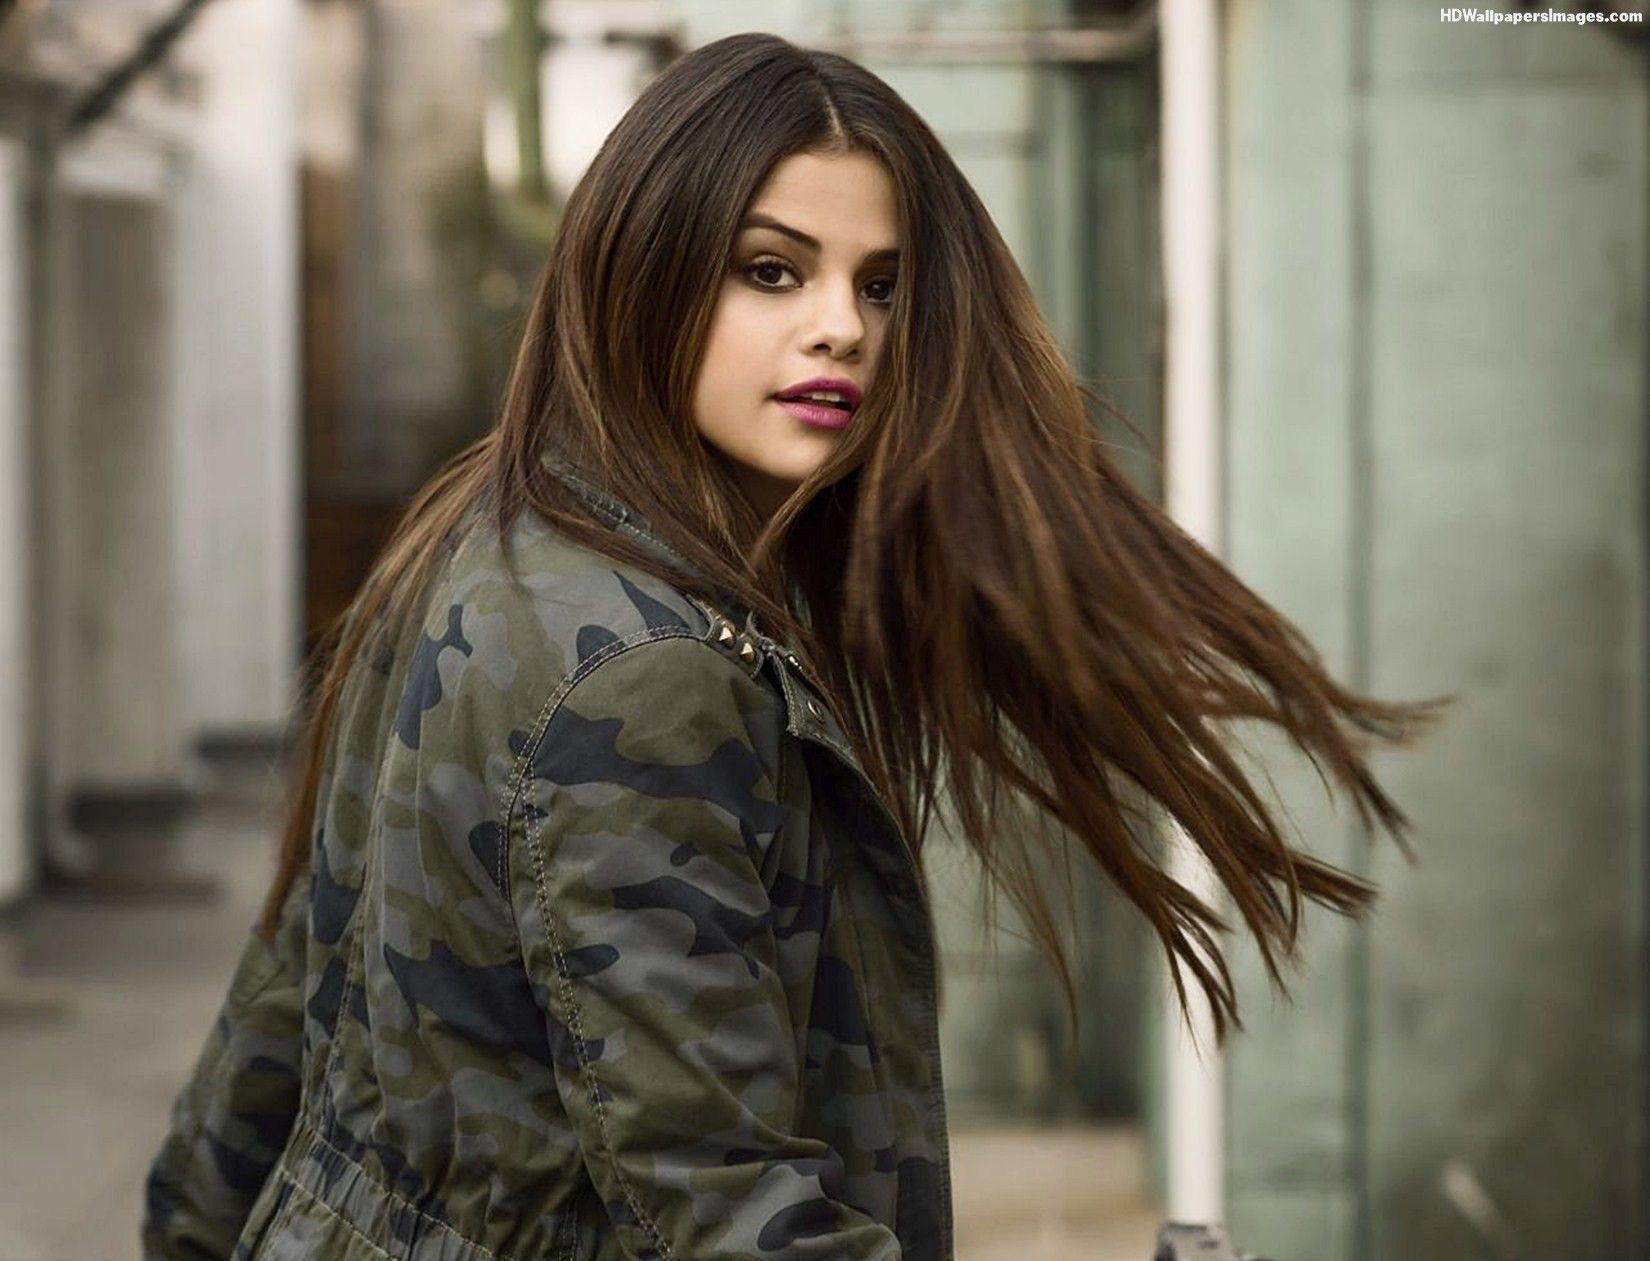 Selena Gomez 2015 Adidas Photoshoot Images Hd Wallpapers